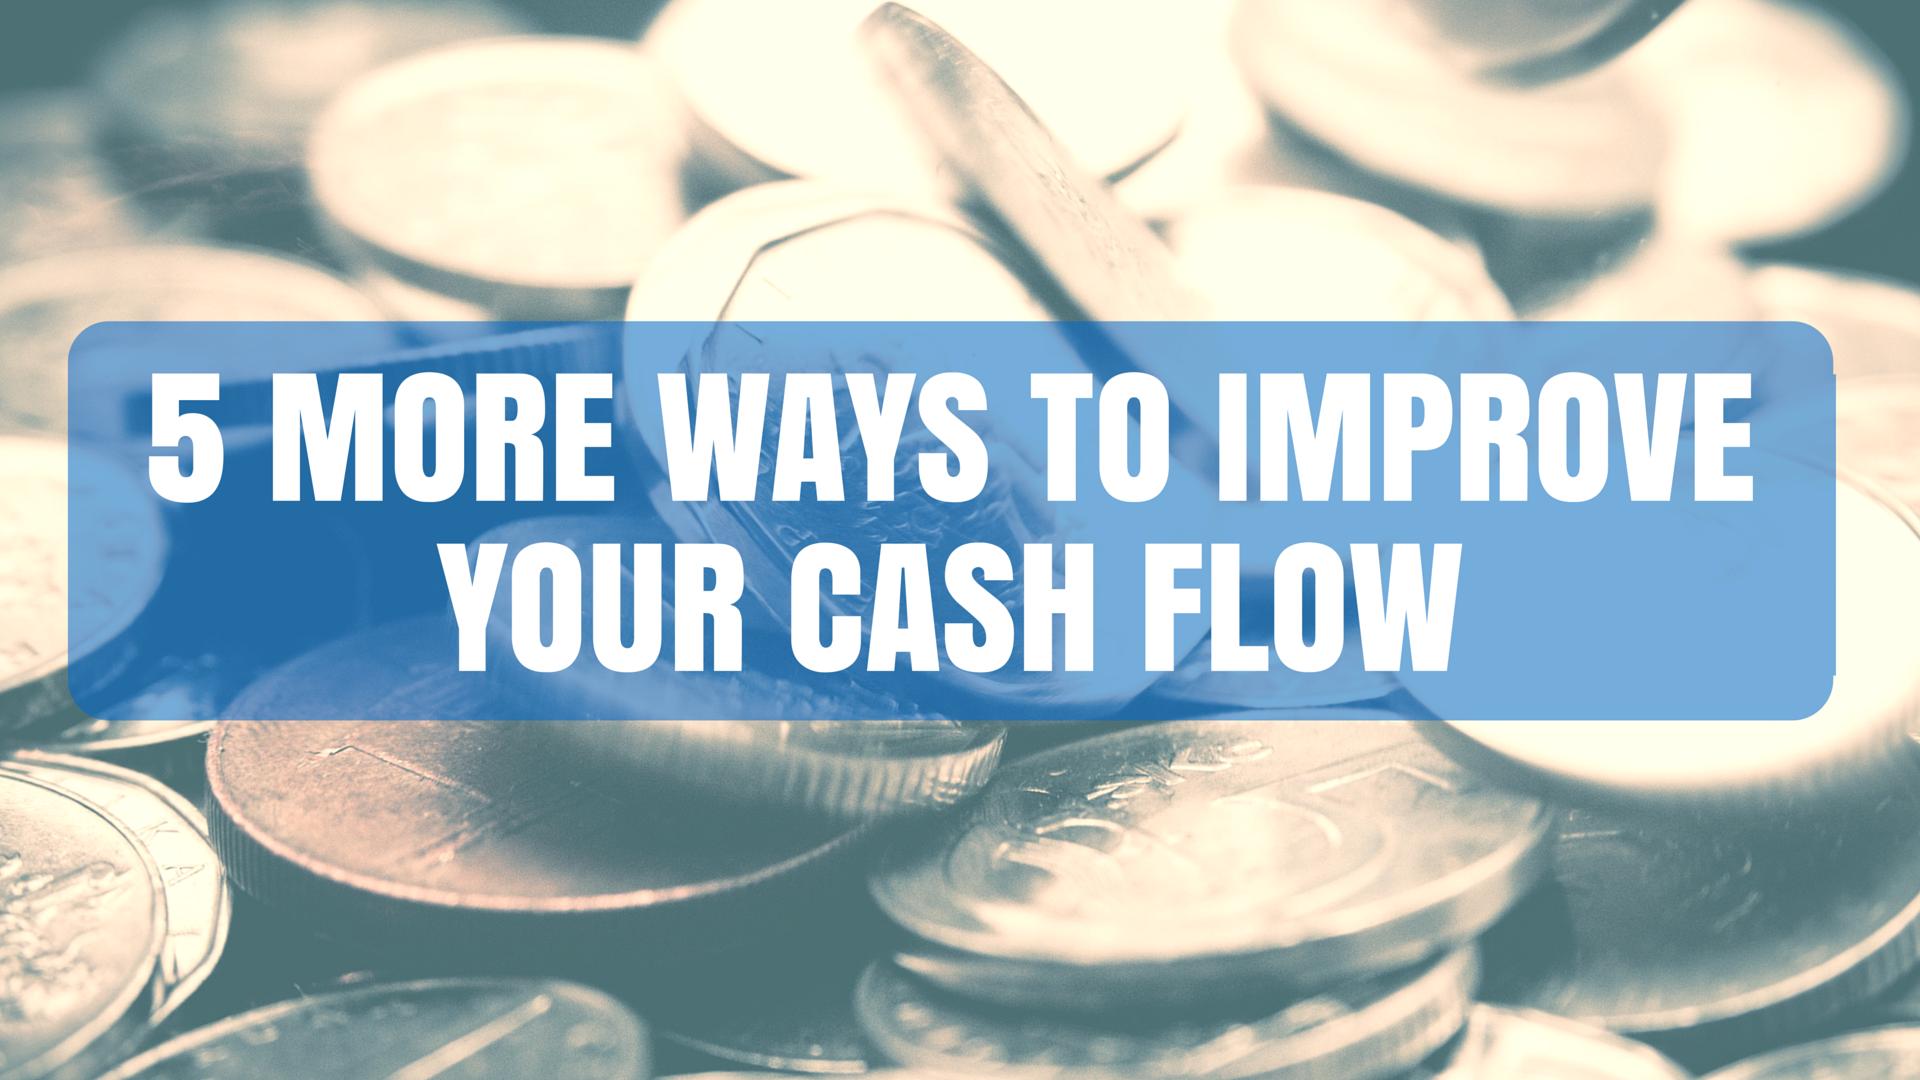 DRA blogpost_5 More Ways to Improve Your Cash Flow